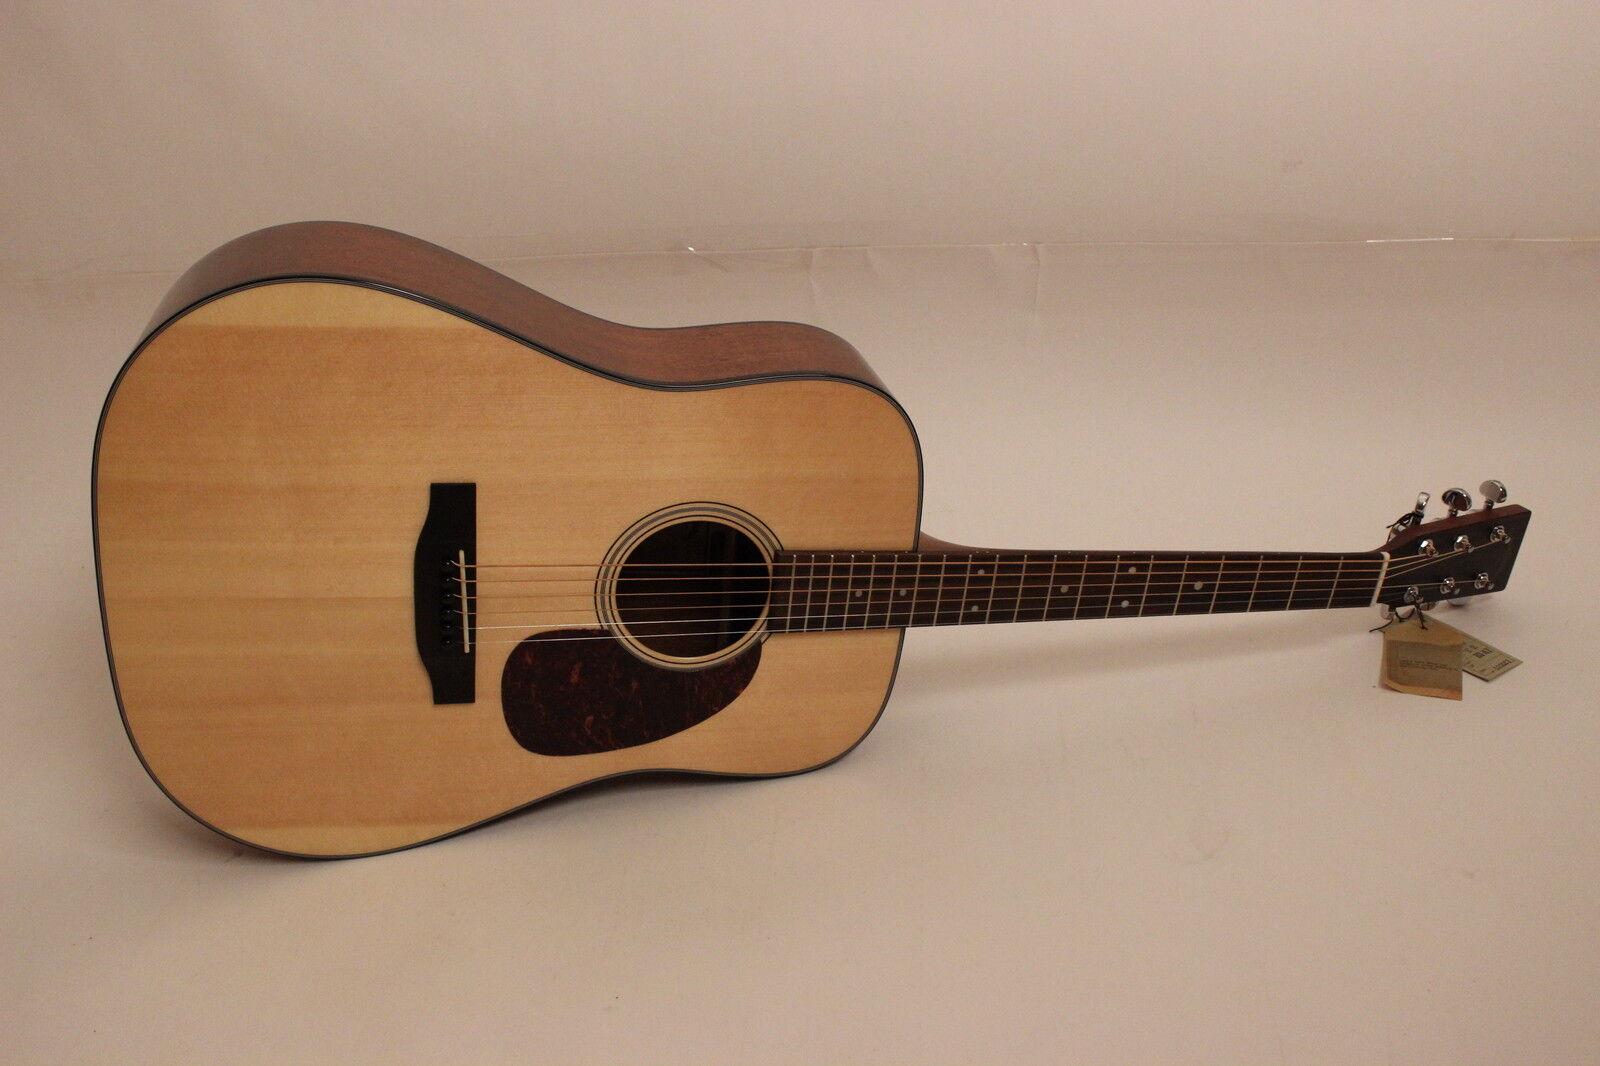 Sigma Guitars Guitar Dm-18 A1 Top + Full Solid Spruce Top